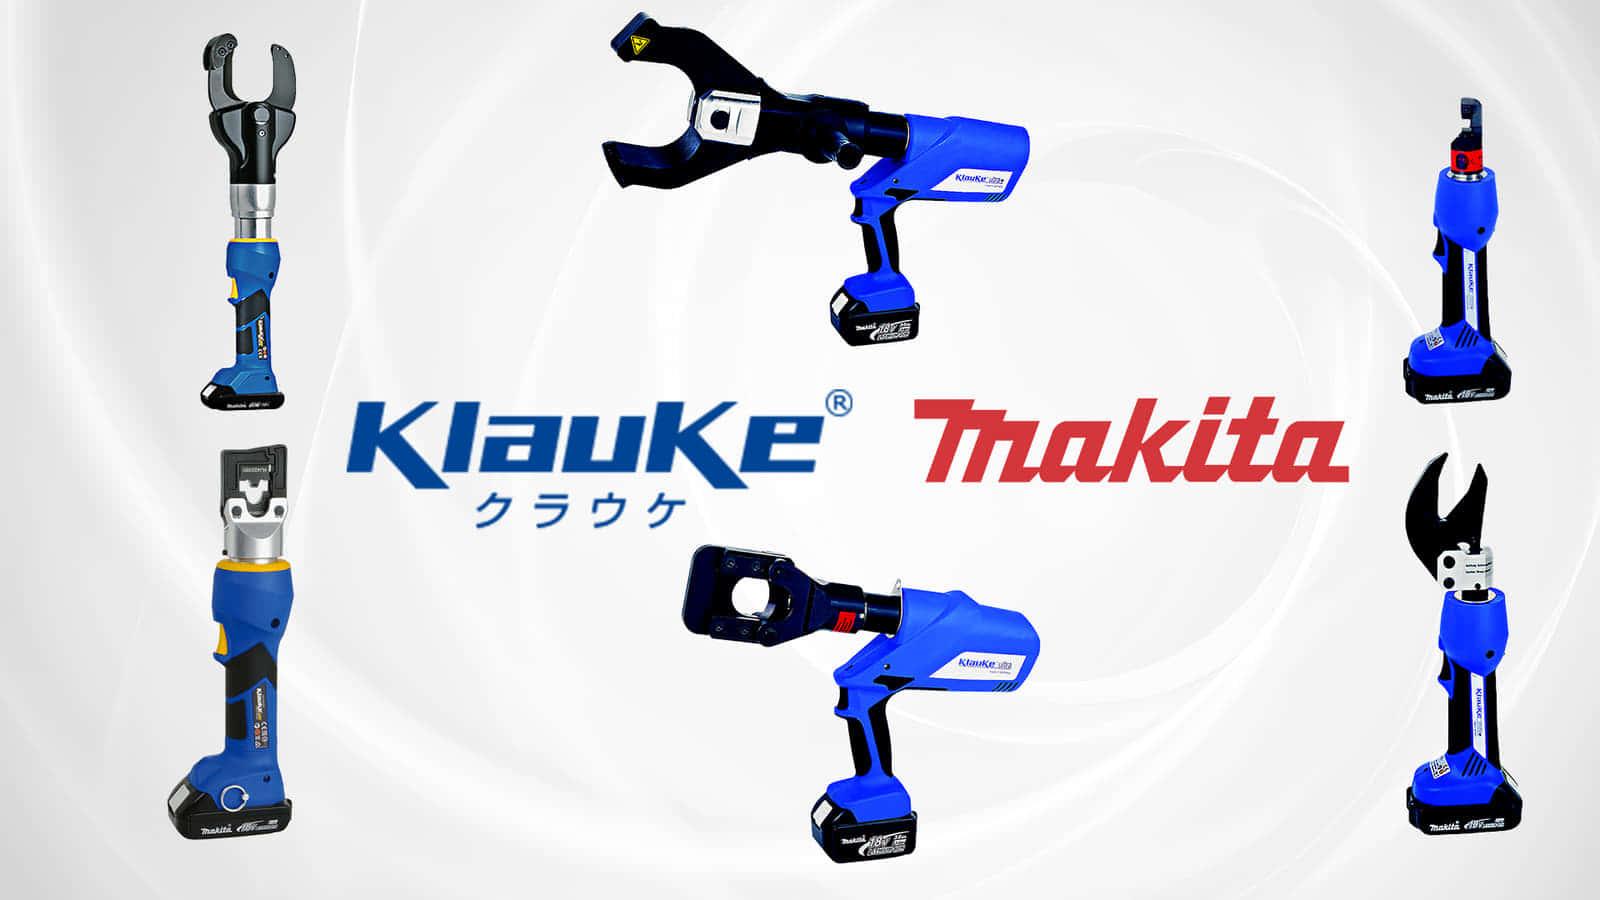 Klauke(クラウケ)電動工具、マキタバッテリーが使える電設工具をラインナップ